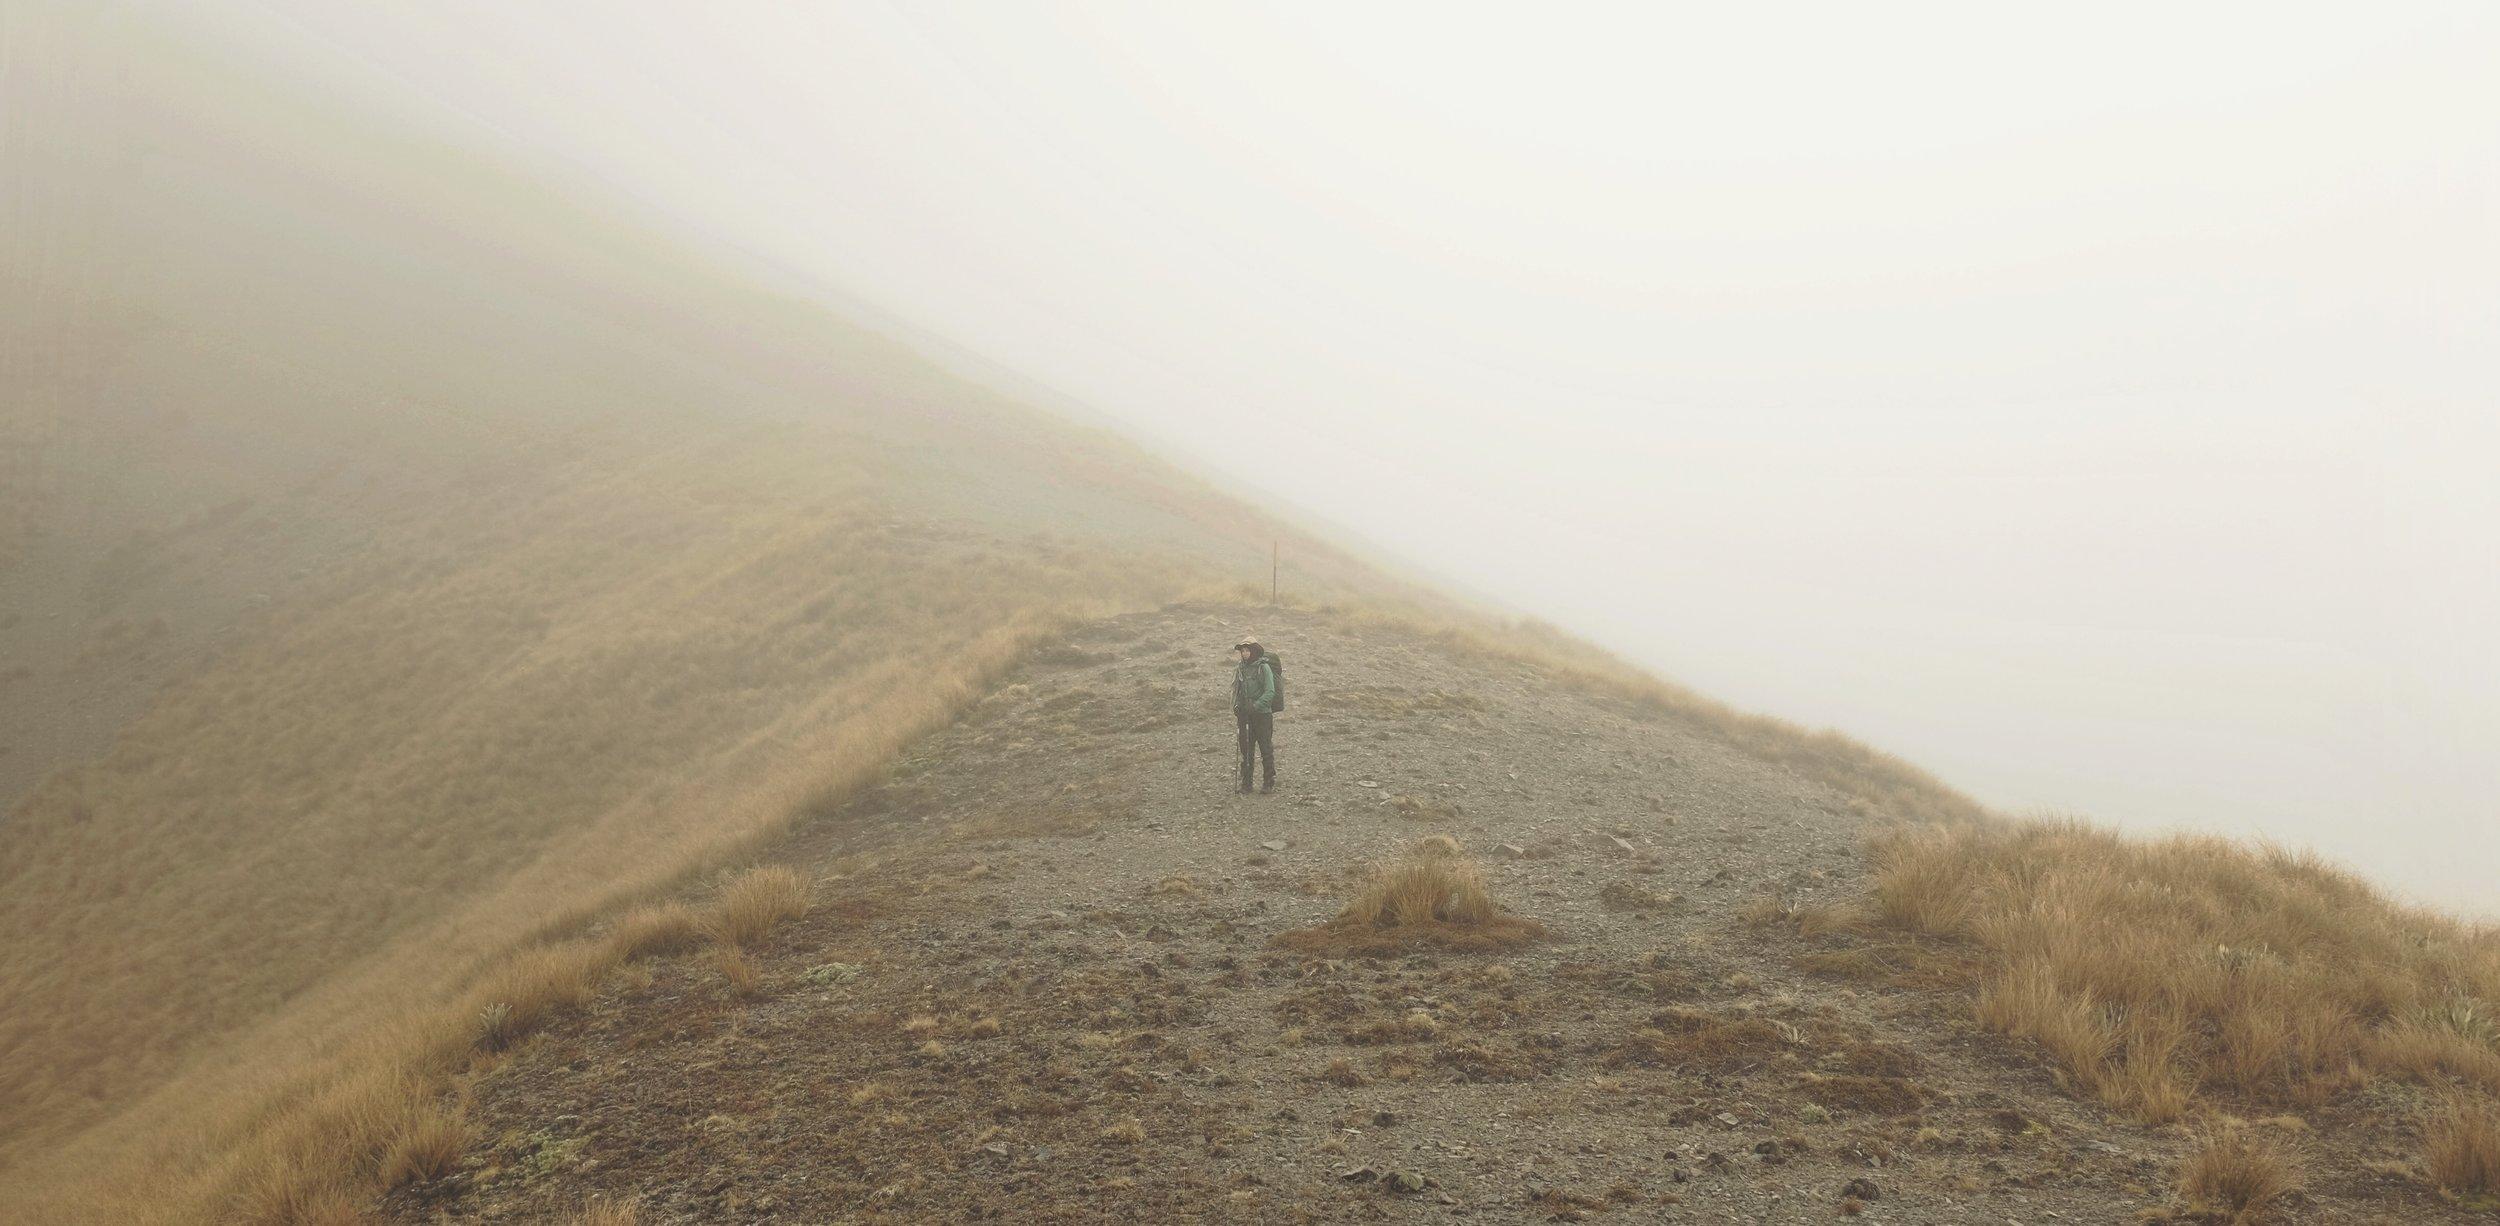 Misty rain hides the surrounding mountains.